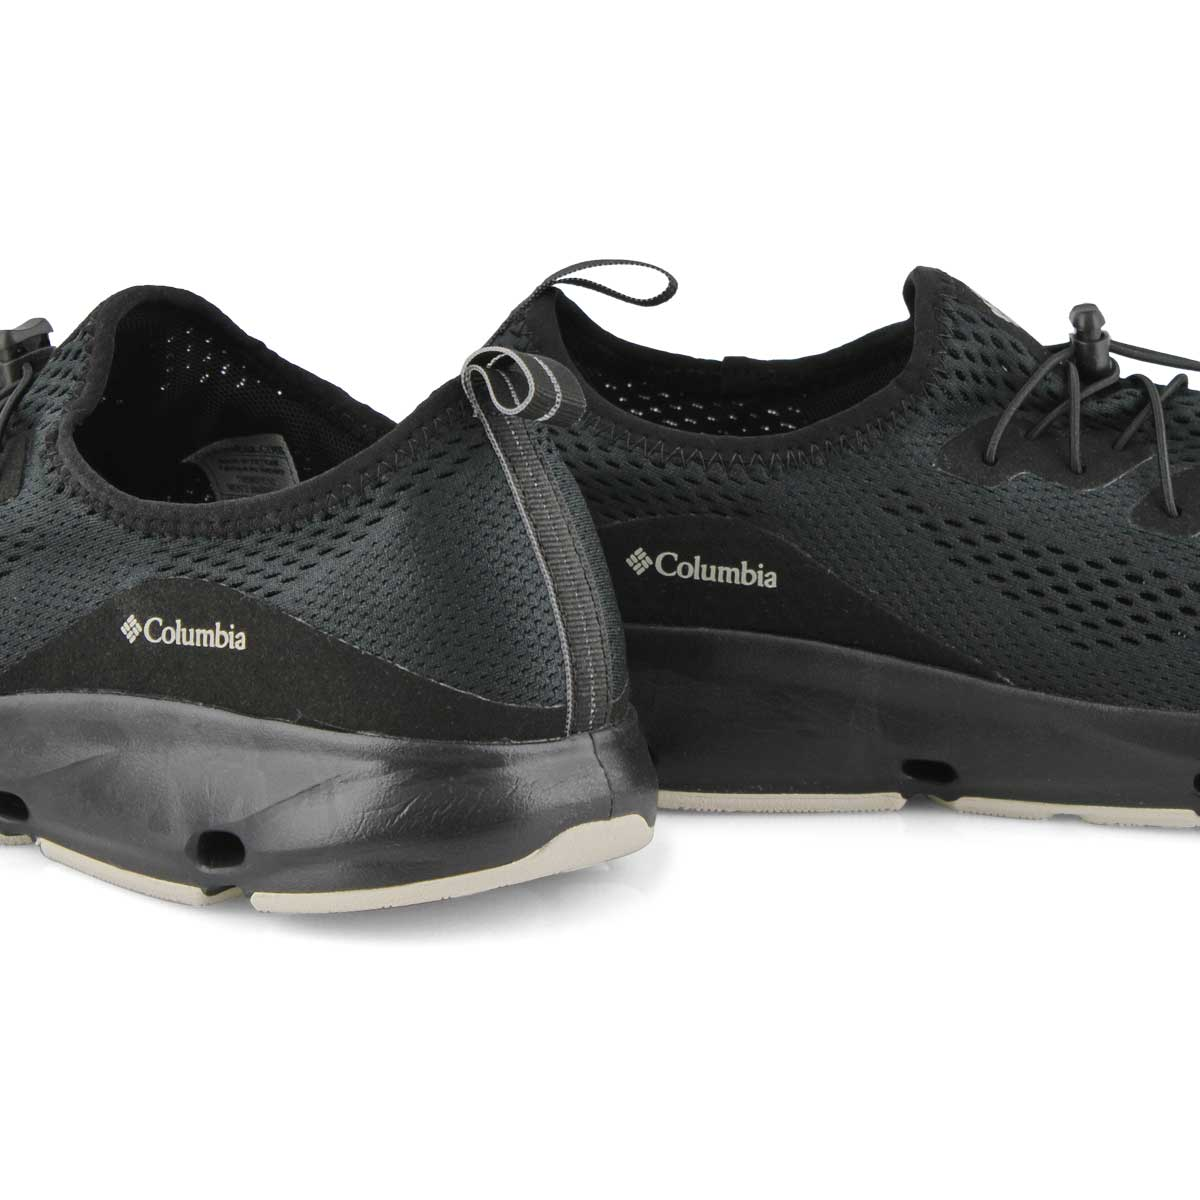 Mns Columbia Vent black fashion sneaker